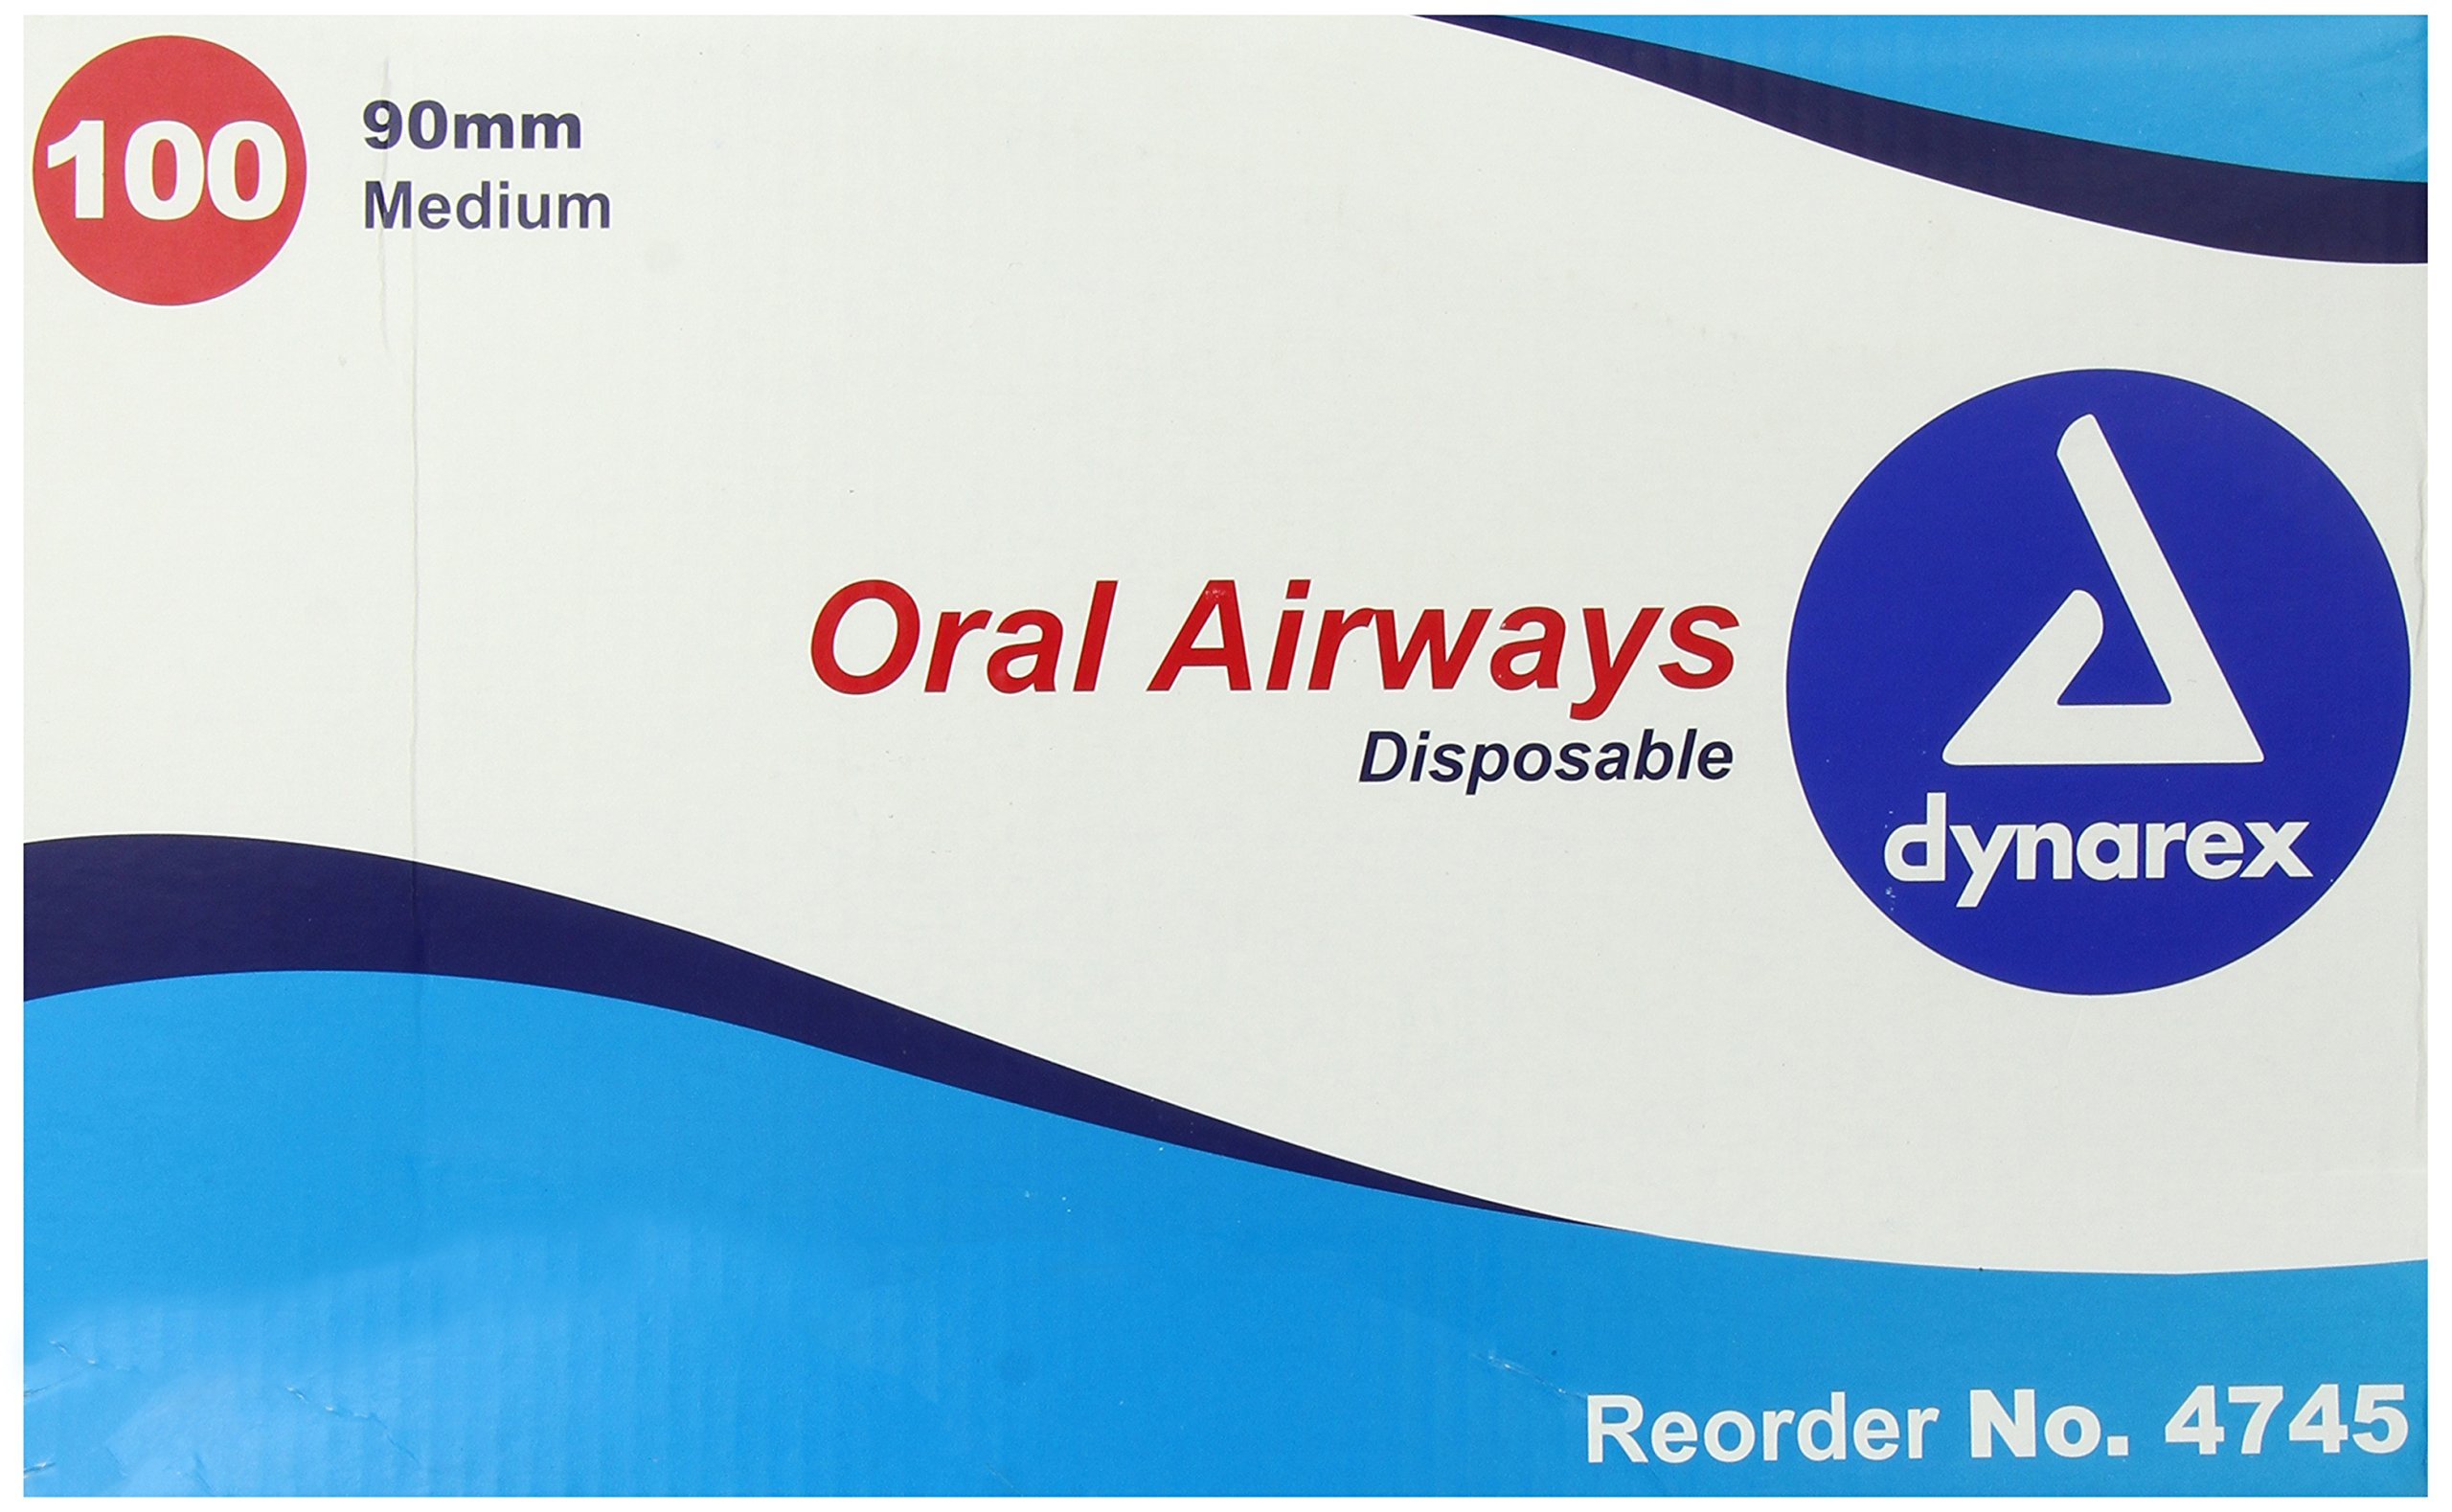 Dynarex Oral Airways (Berman Type) 90mm, Medium Yellow 100/Cs by Dynarex